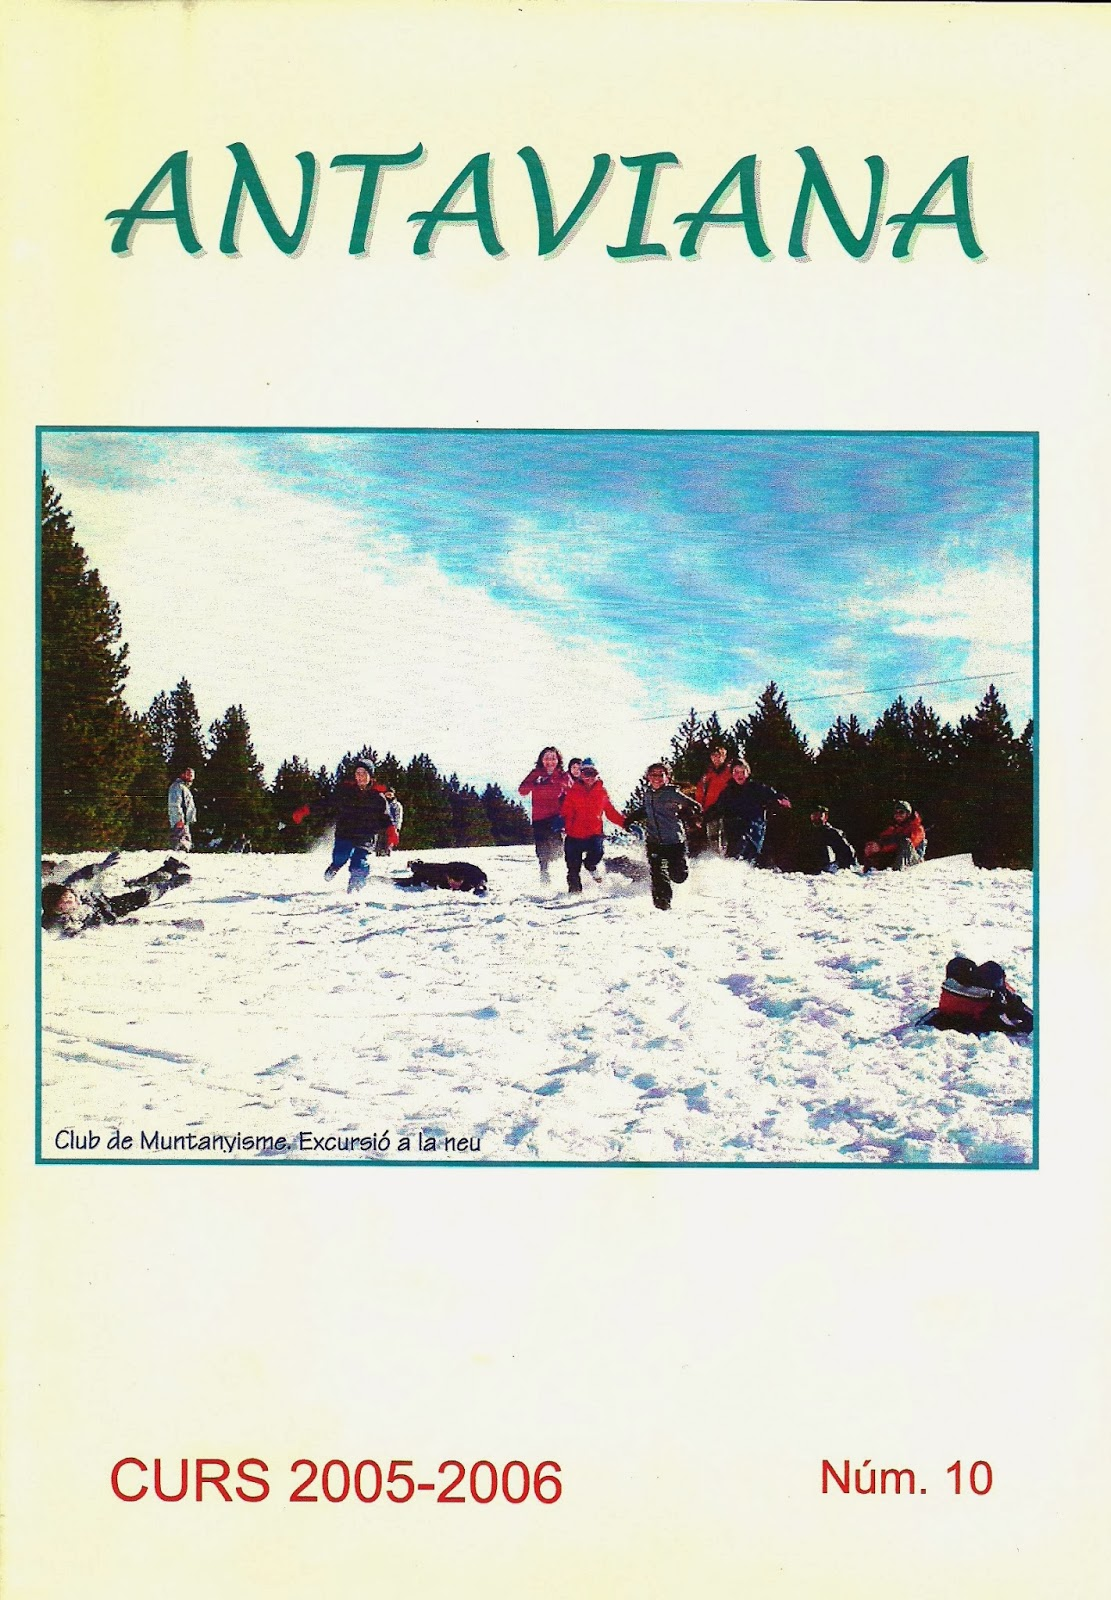 http://issuu.com/blocsdantaviana/docs/revista_antaviana_n___10__2005-2006